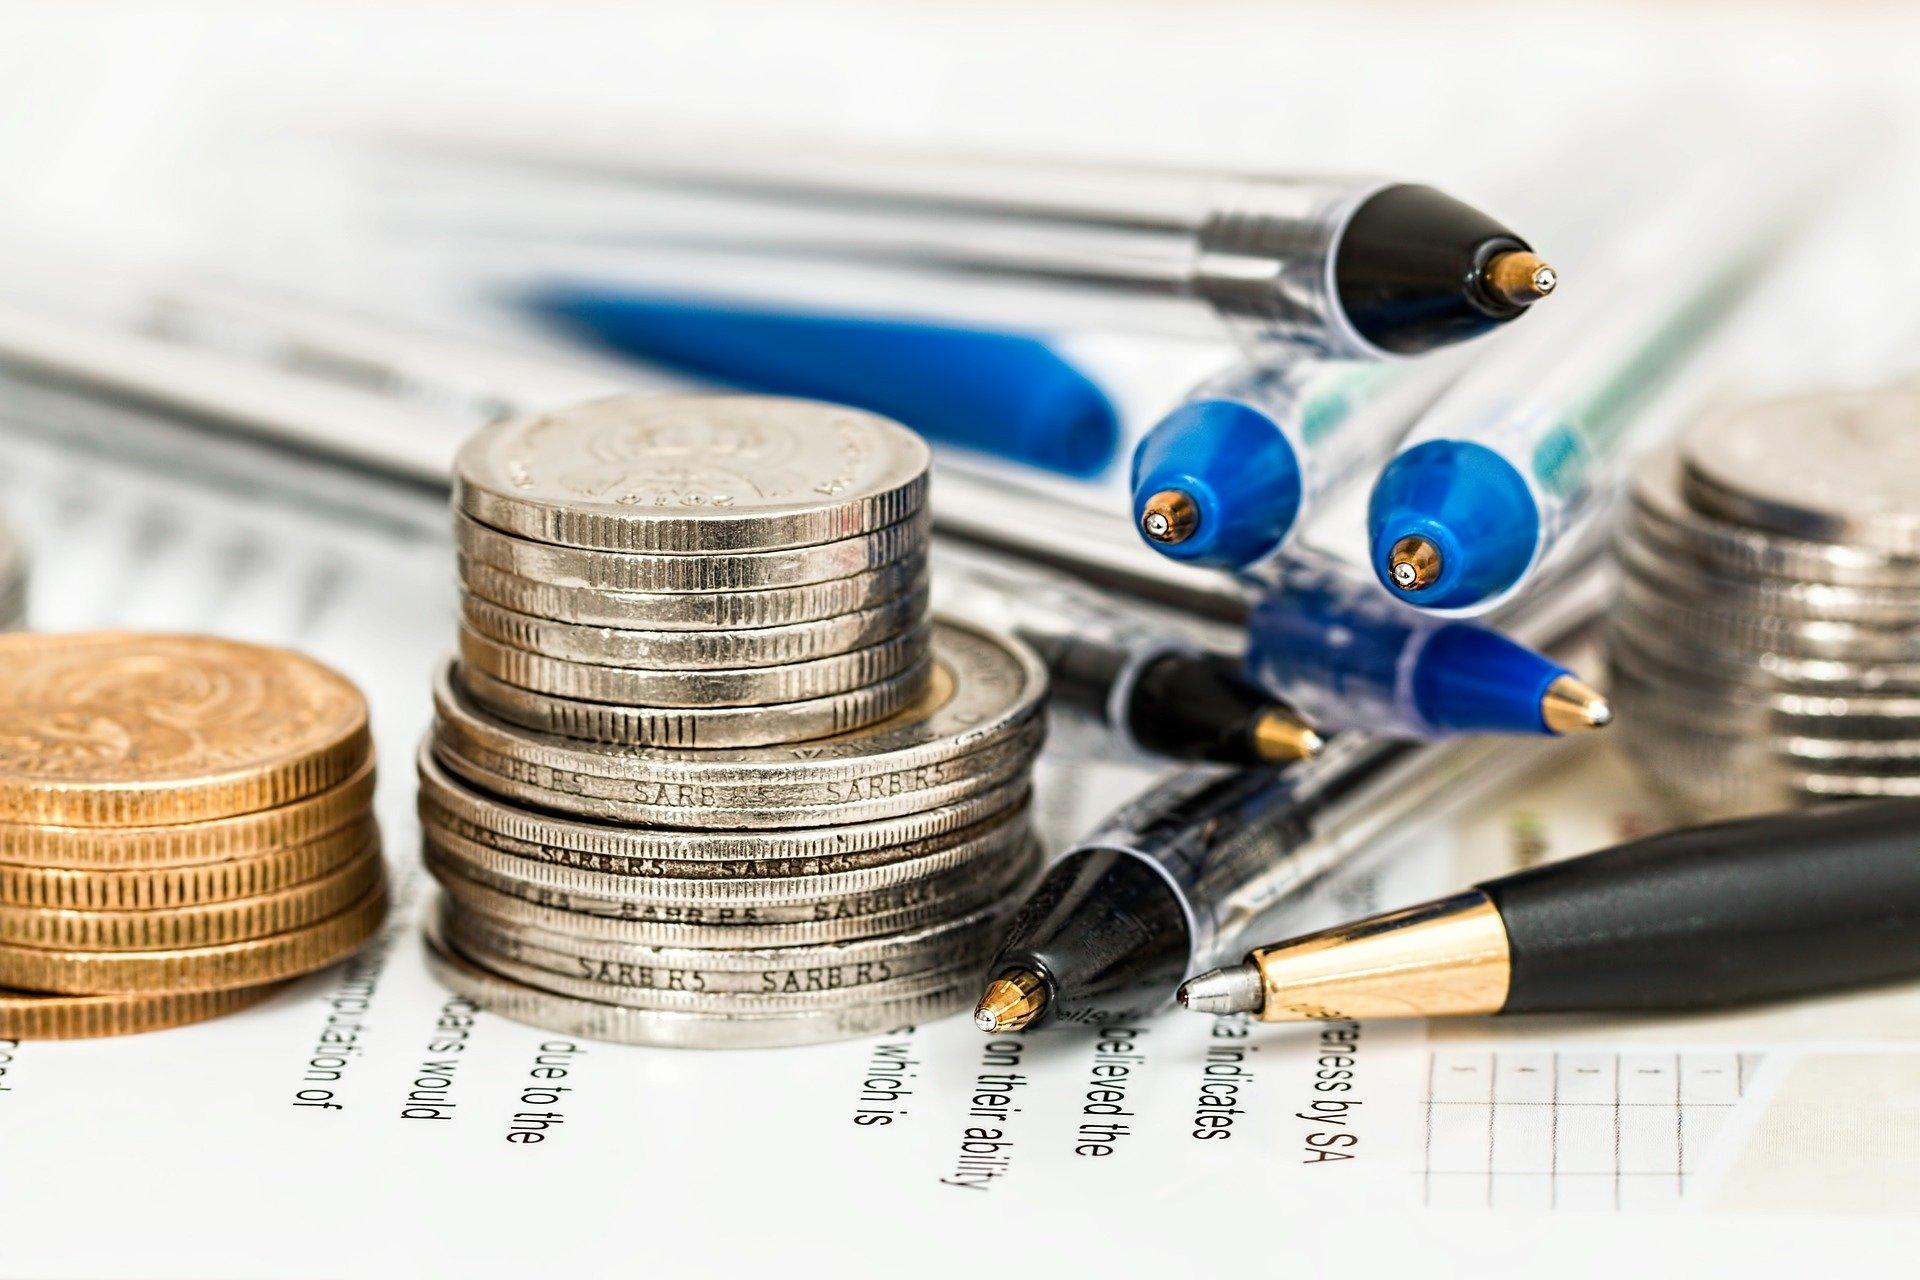 Impostos regulares das empresas